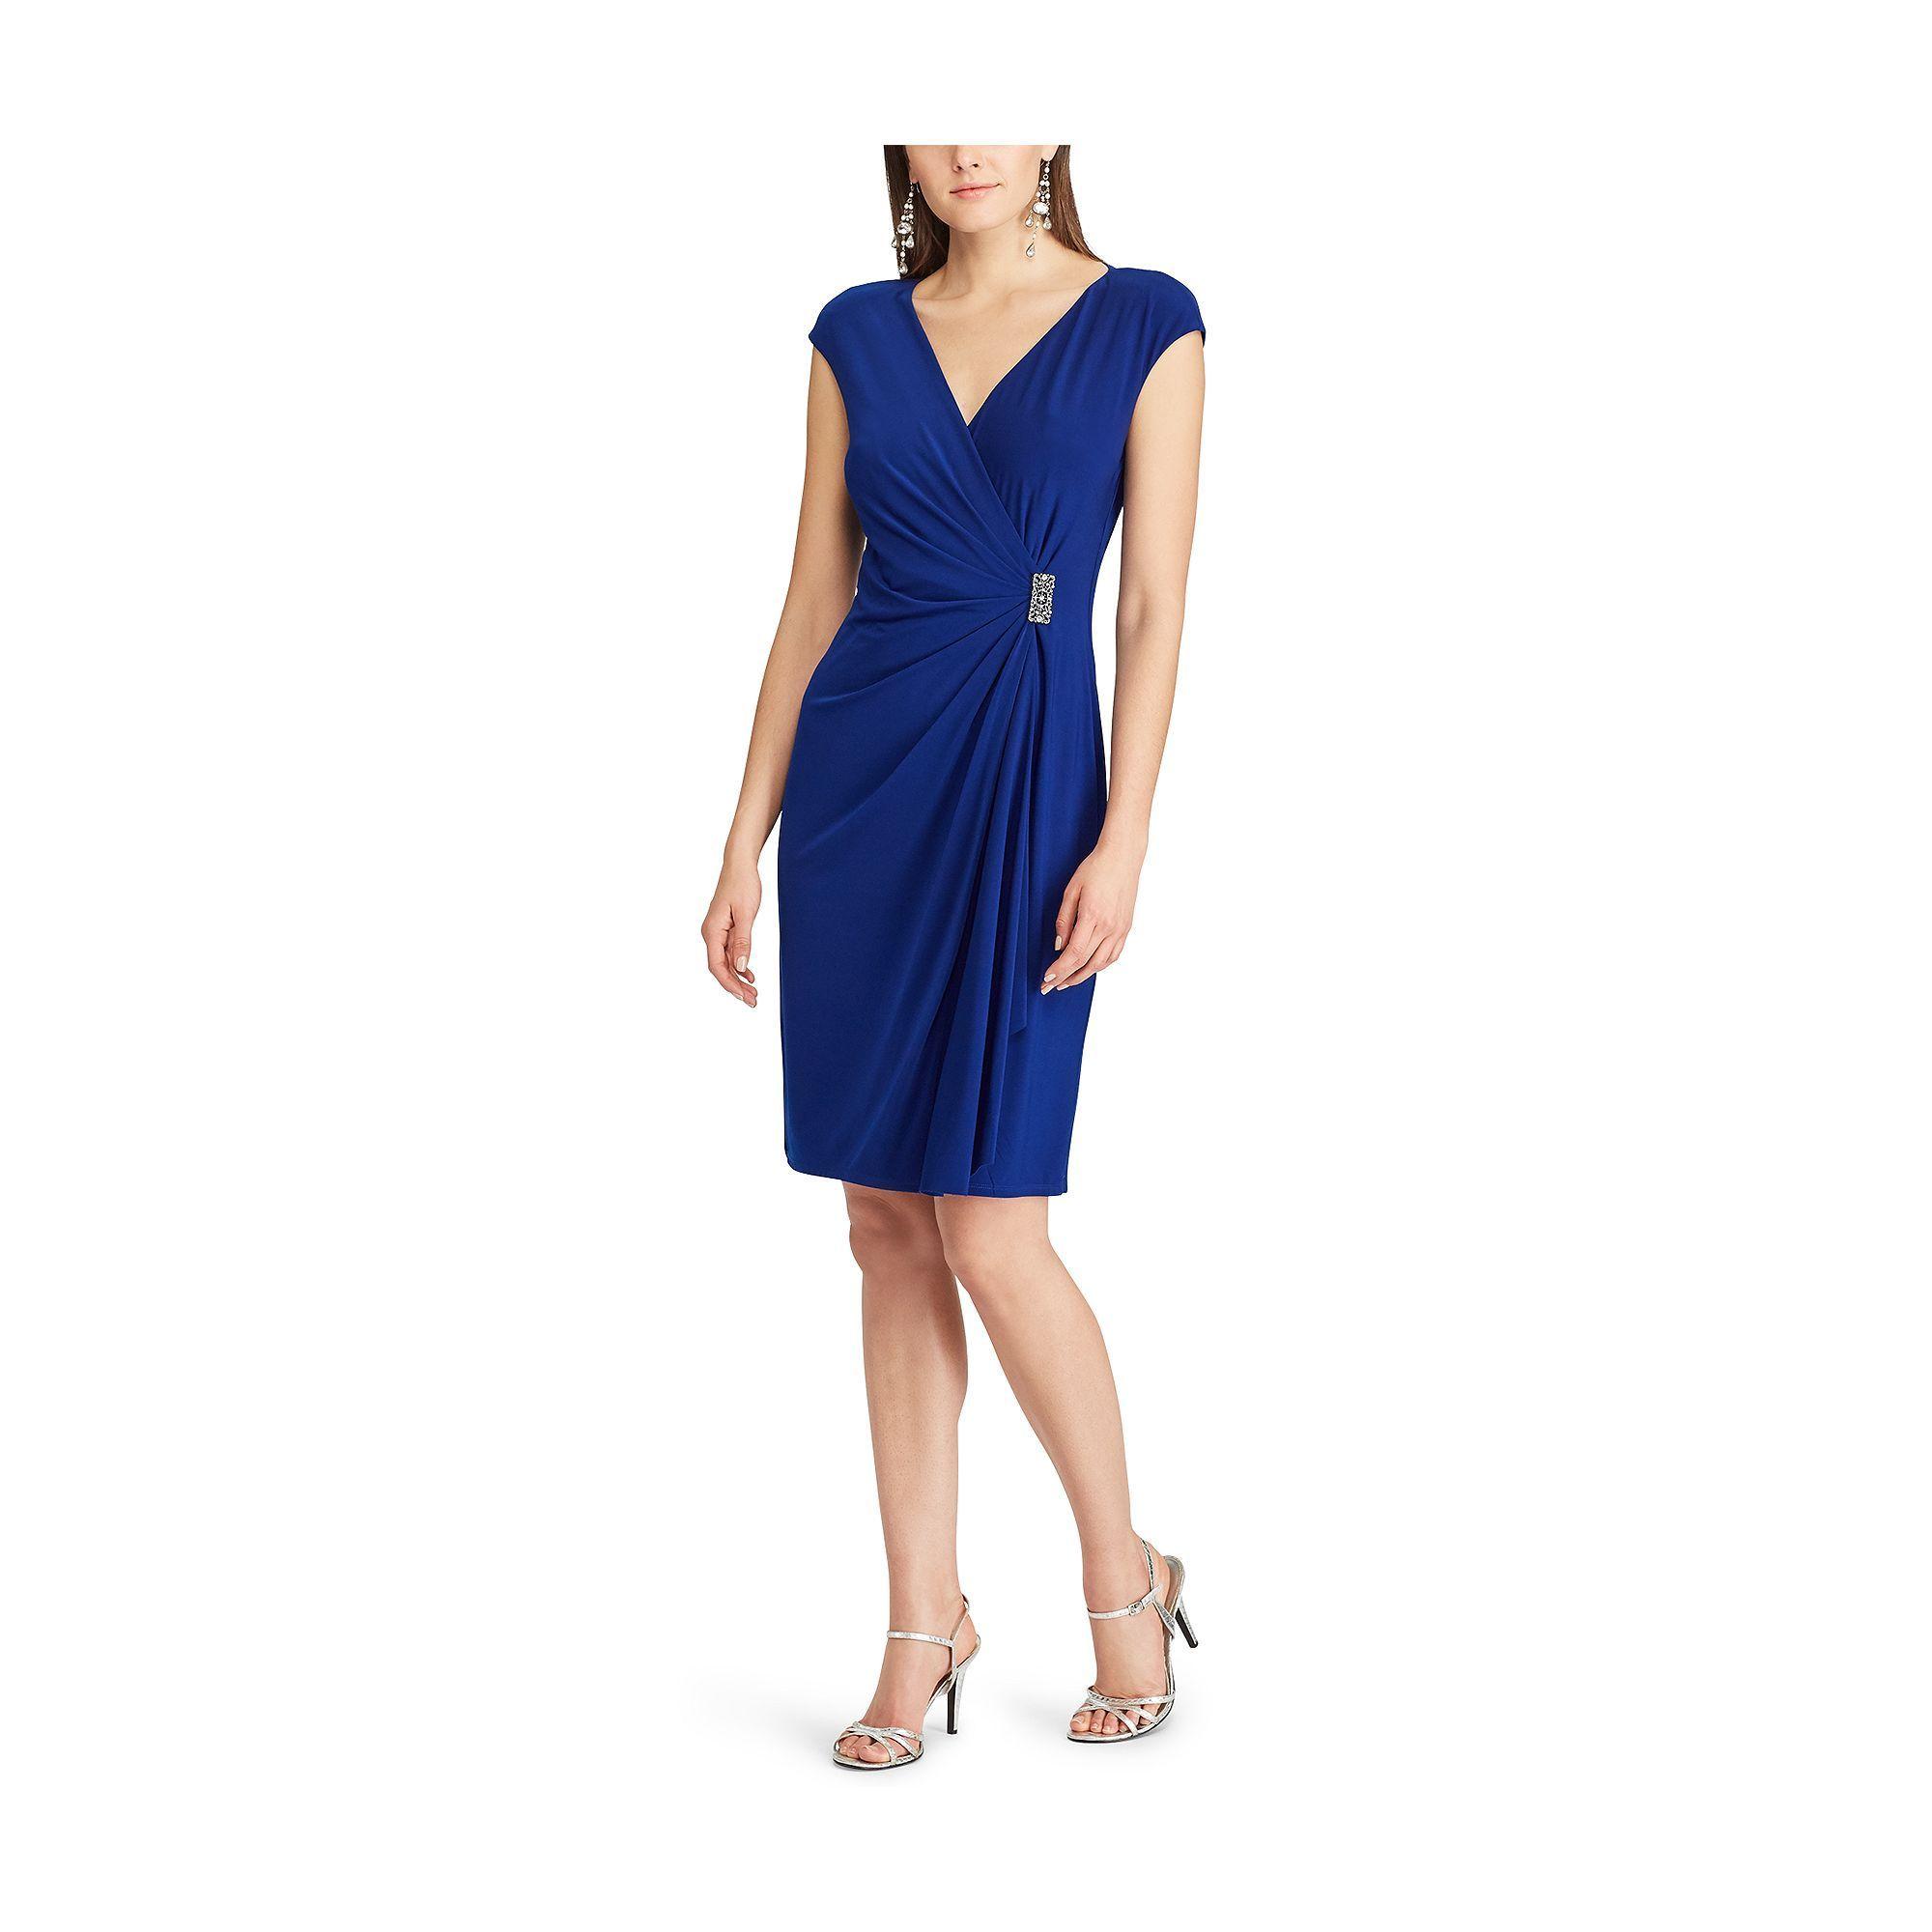 Womenus chaps embellished ruffle sheath dress size medium black